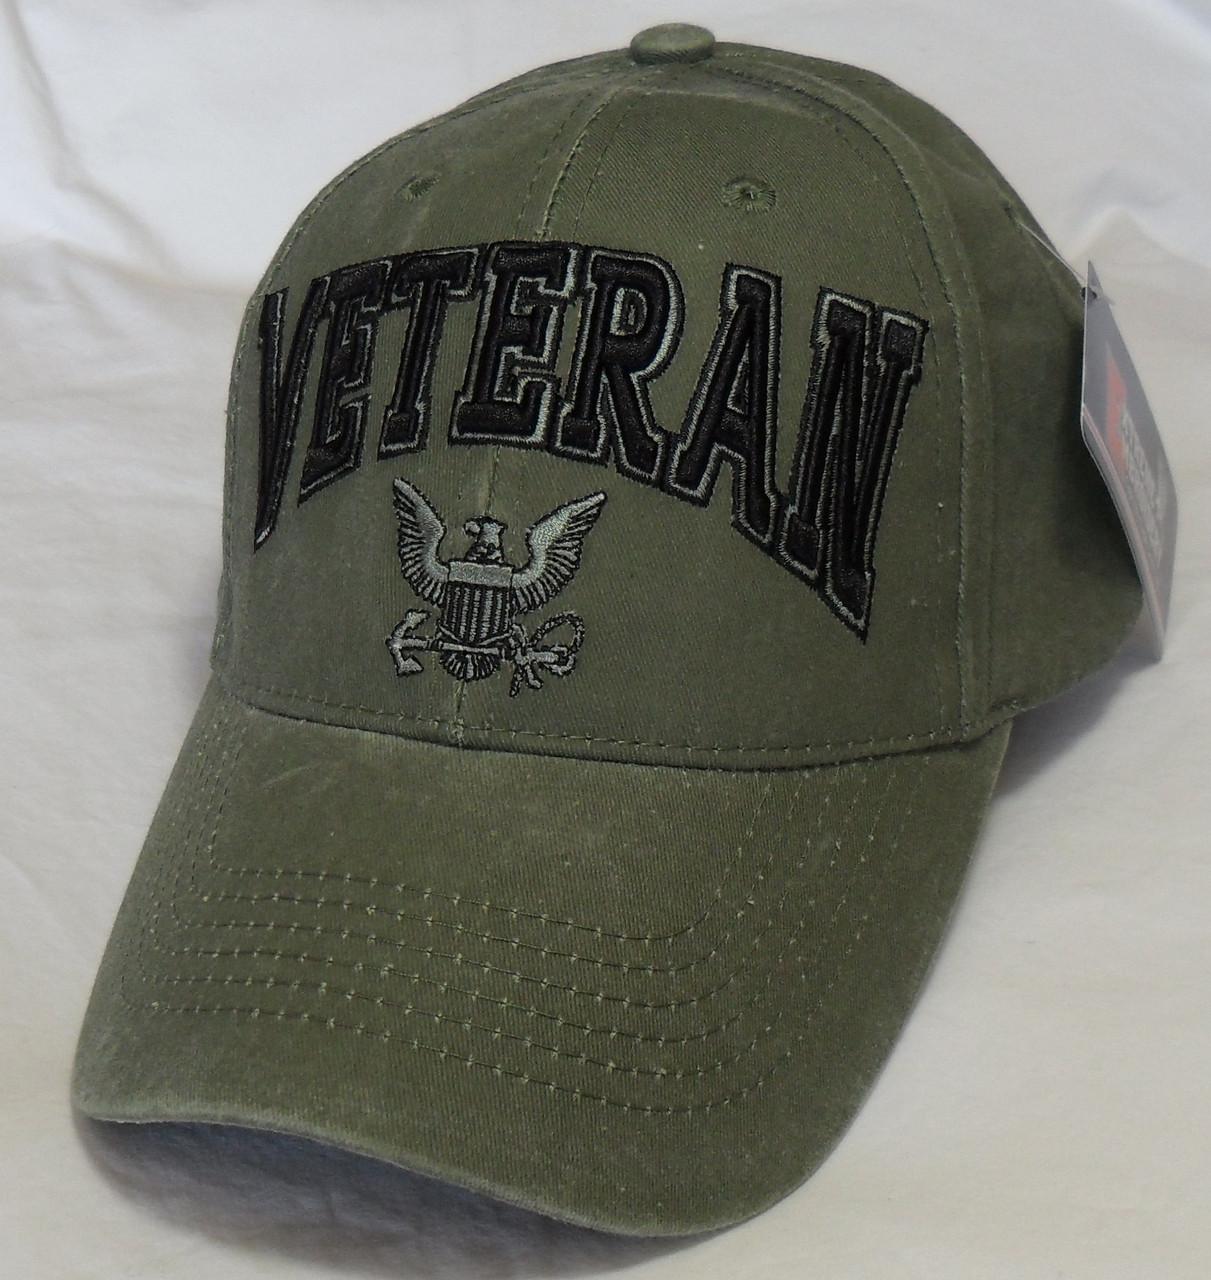 bada938ab76 US NAVY UNITED STATES NAVY VETERAN - ODG Officially Licensed Baseball Cap  Hat